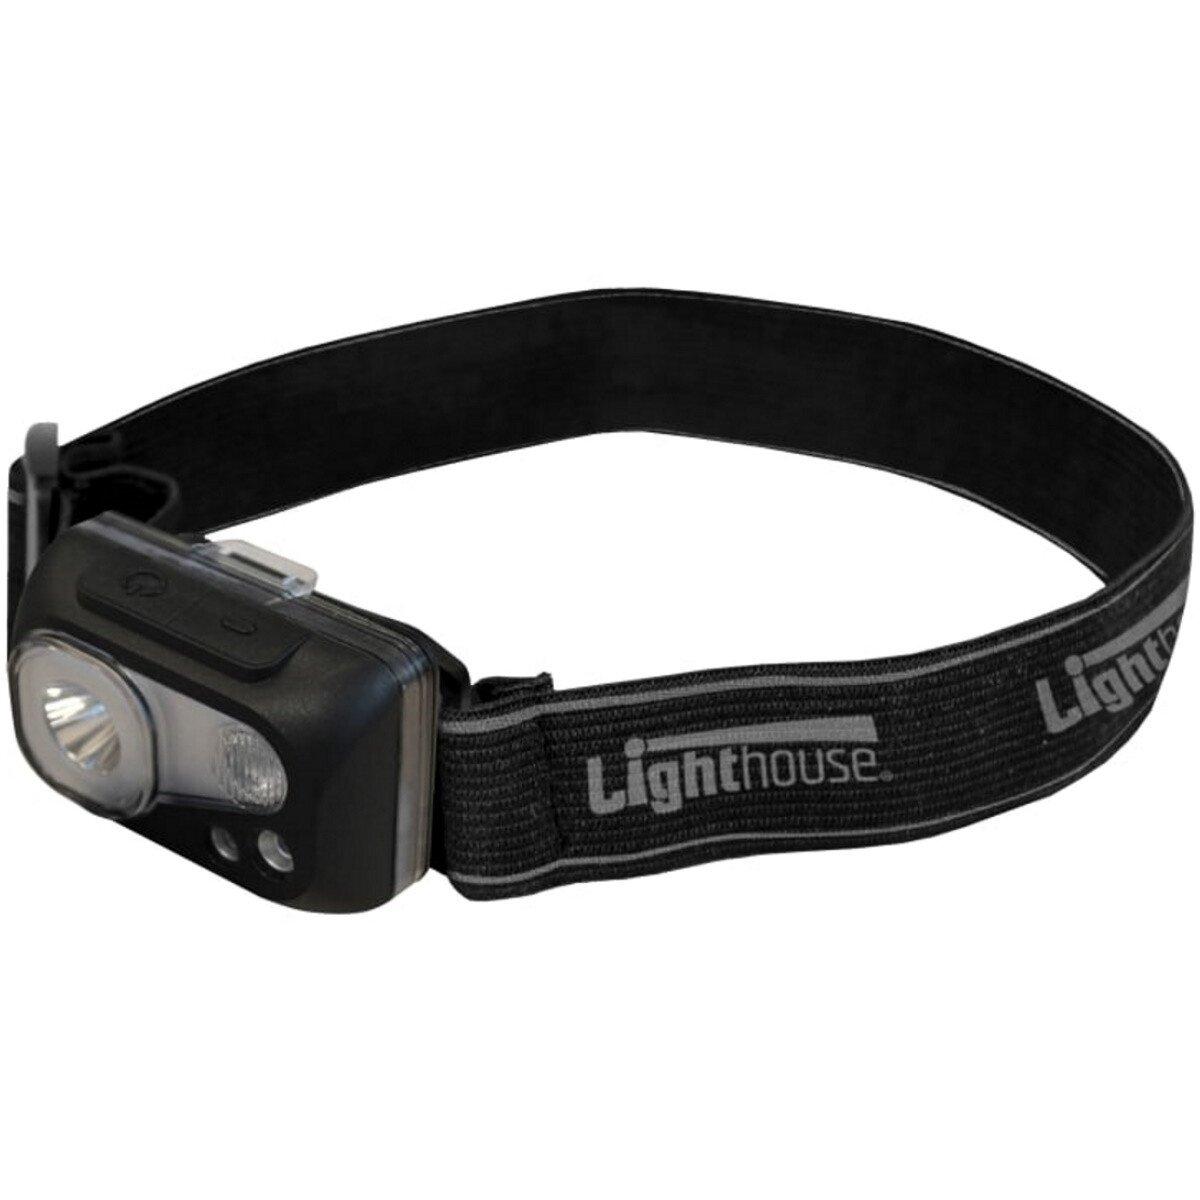 Lighthouse HL-H0505-1 Elite Headlight 300 Lumens L/HEHEAD300